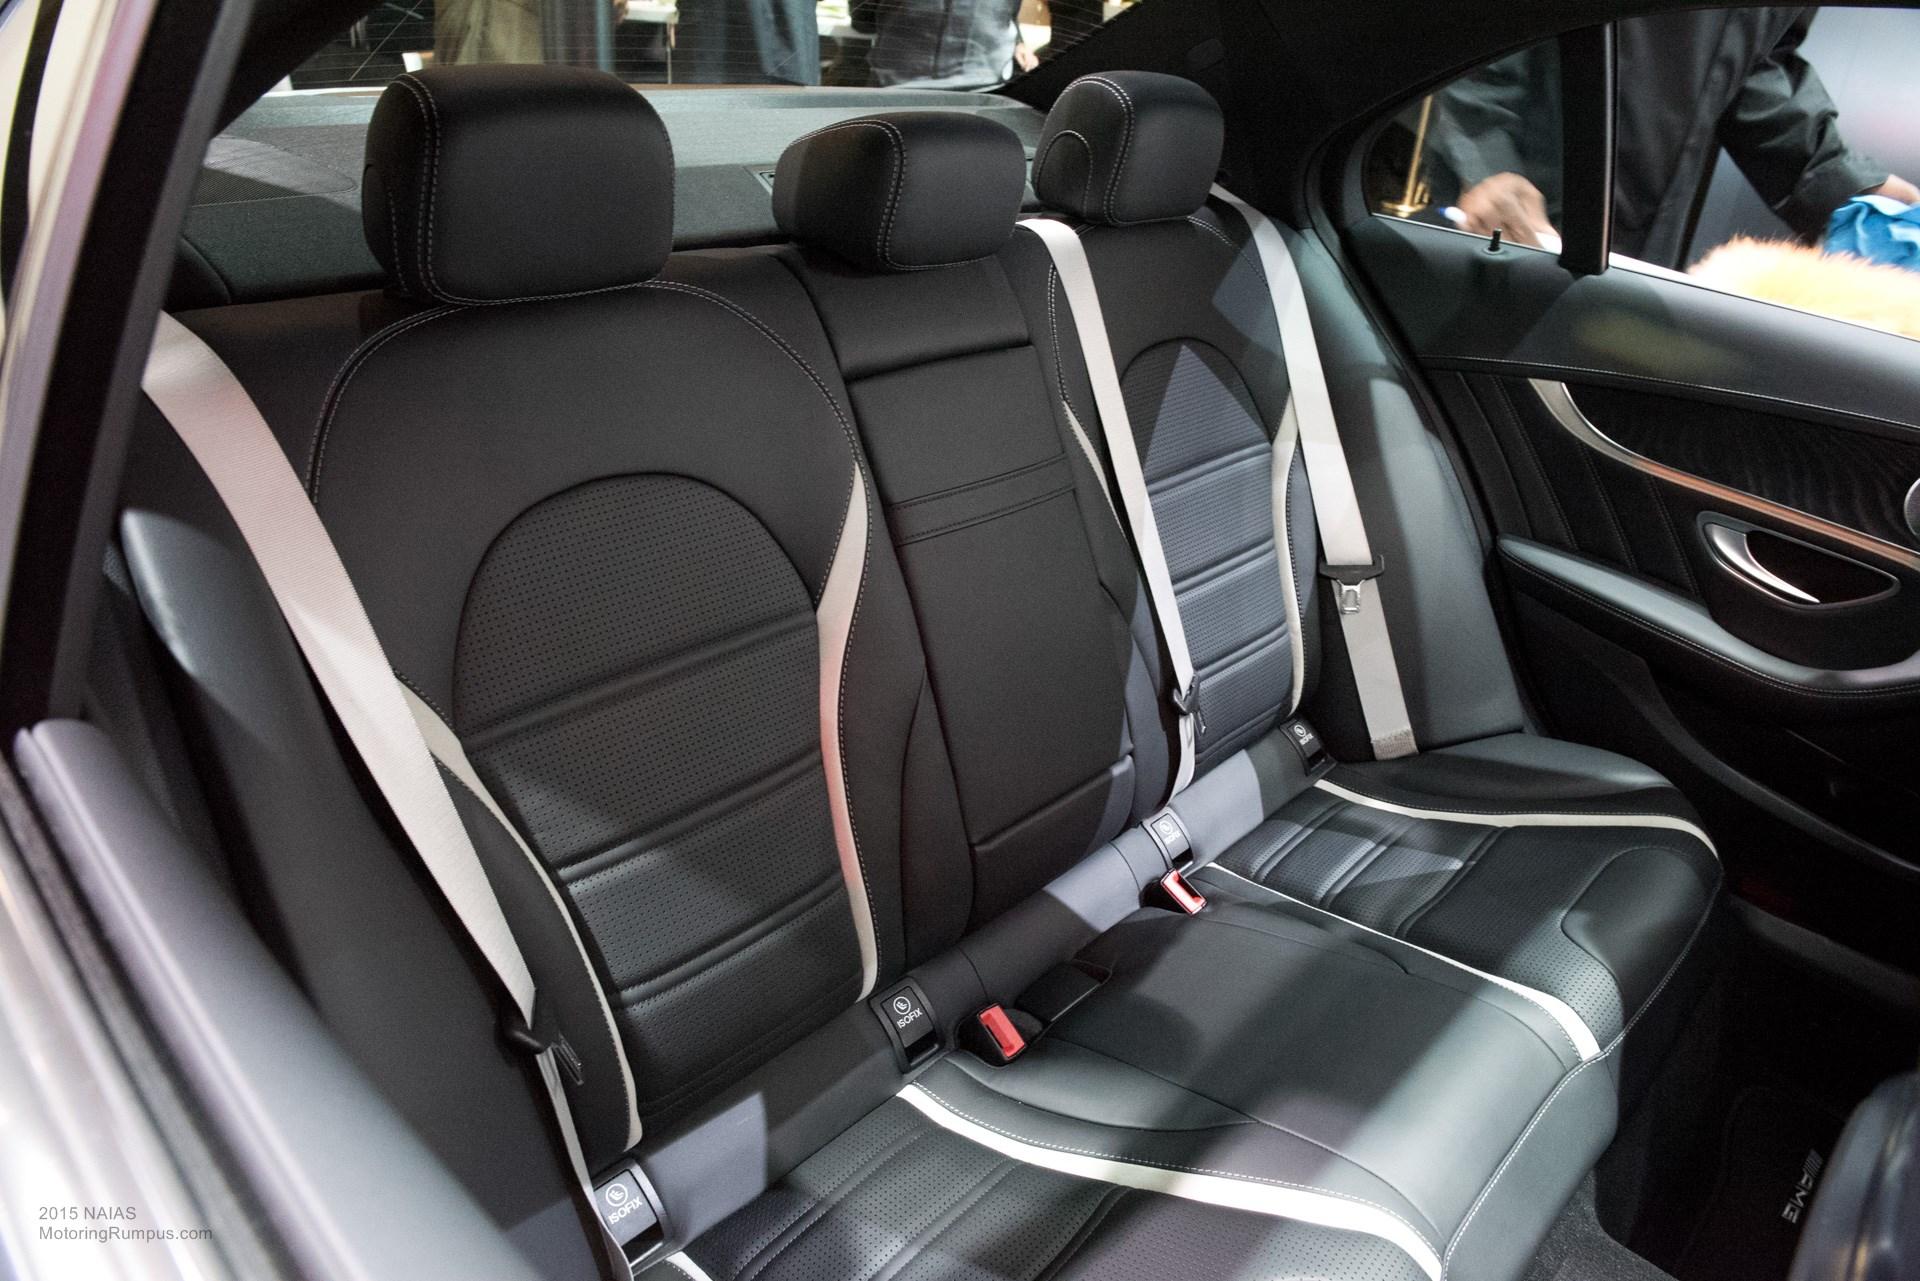 2015 NAIAS Mercedes-AMG C63 S Rear Seats